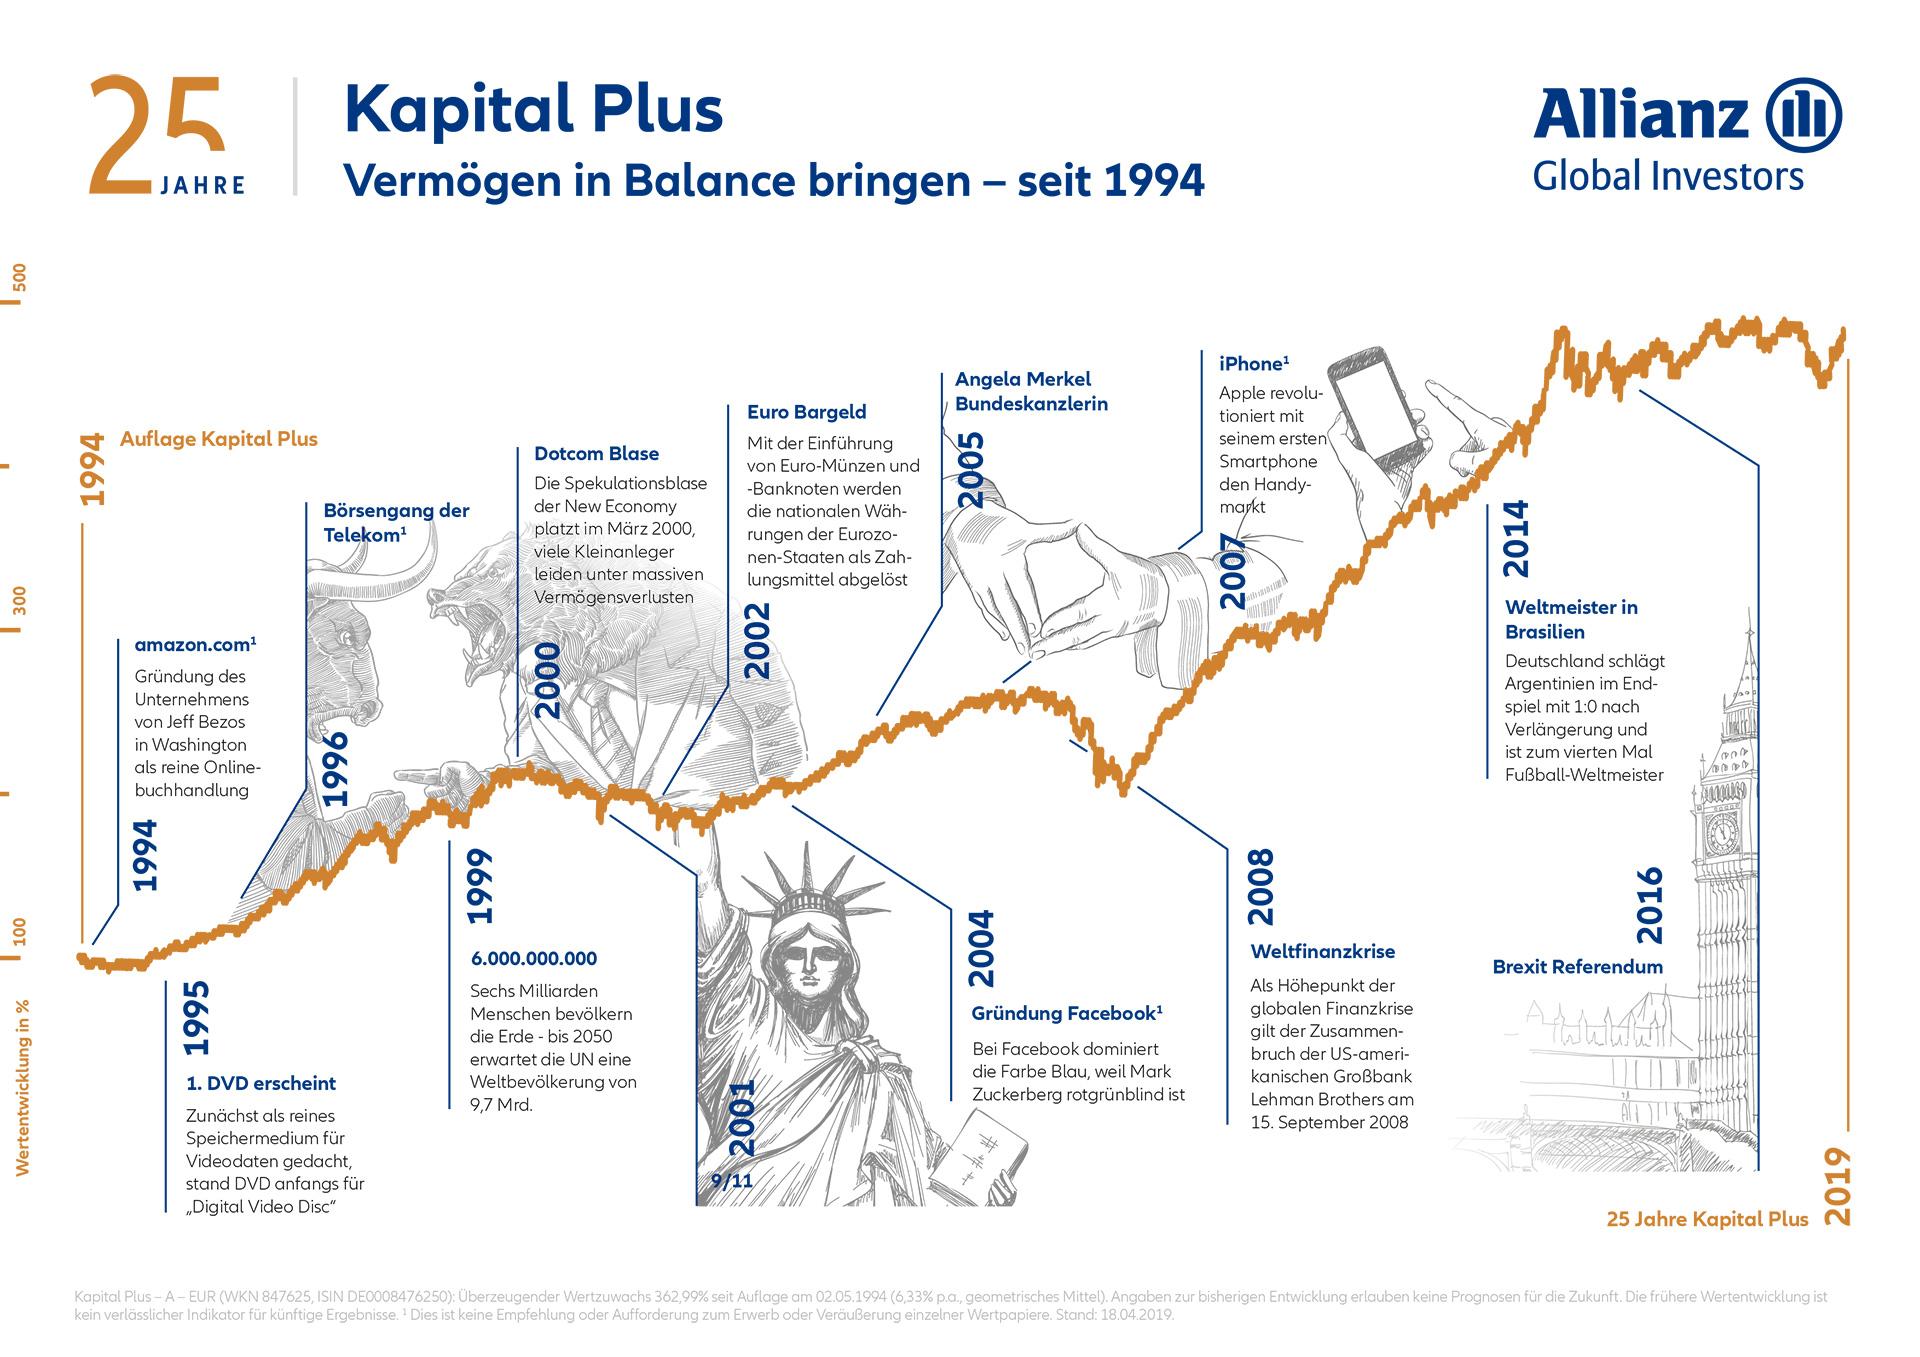 Allianz Global Investors Allianz Kapital Plus